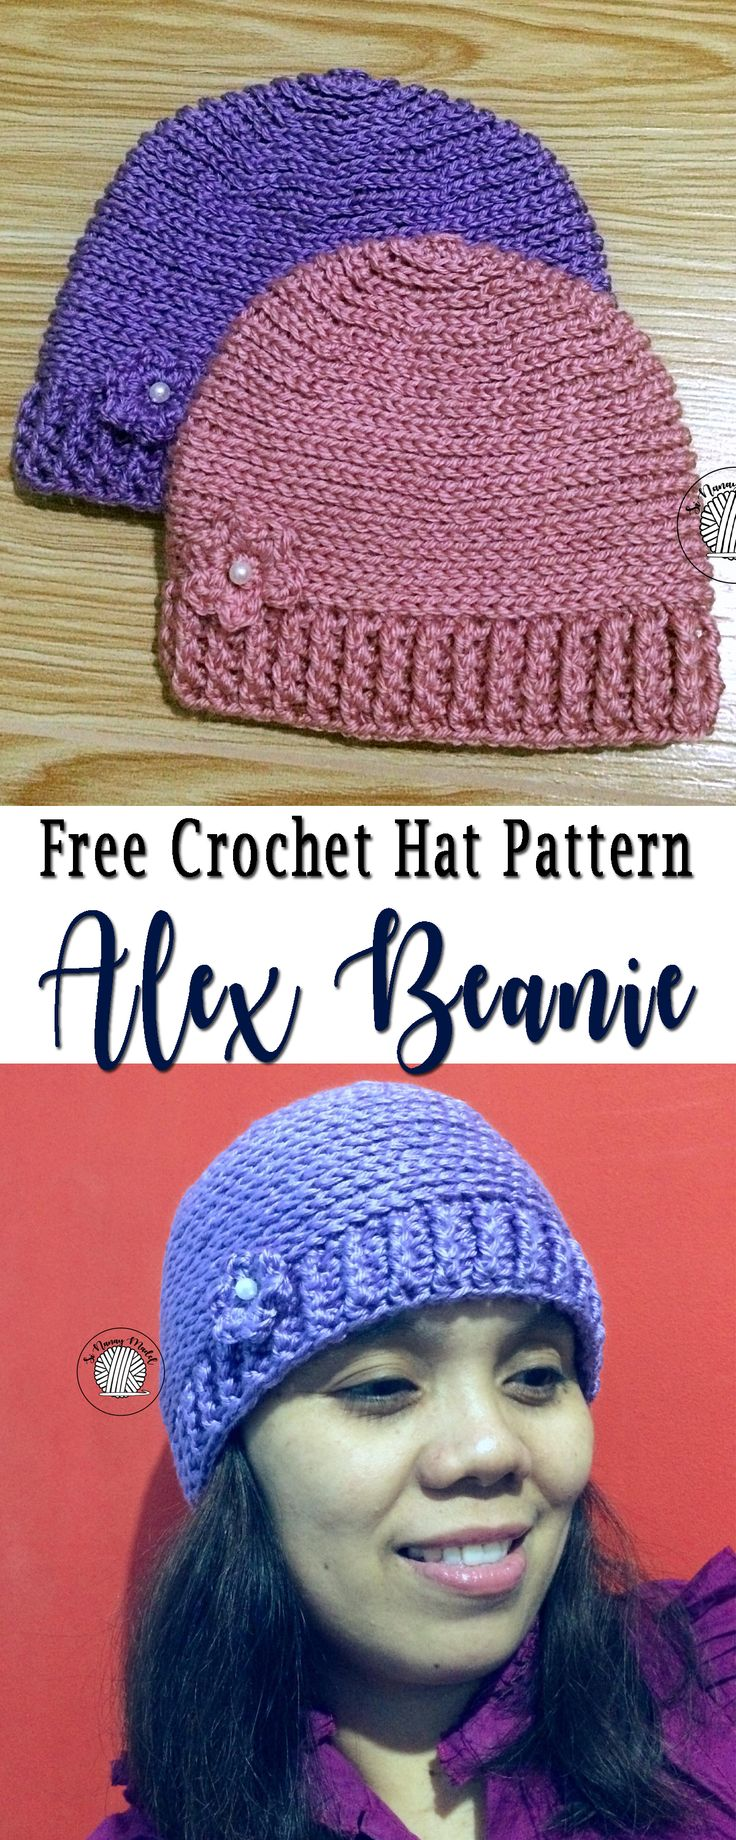 3108 best Free Crochet & Knitting Patterns images on Pinterest ...